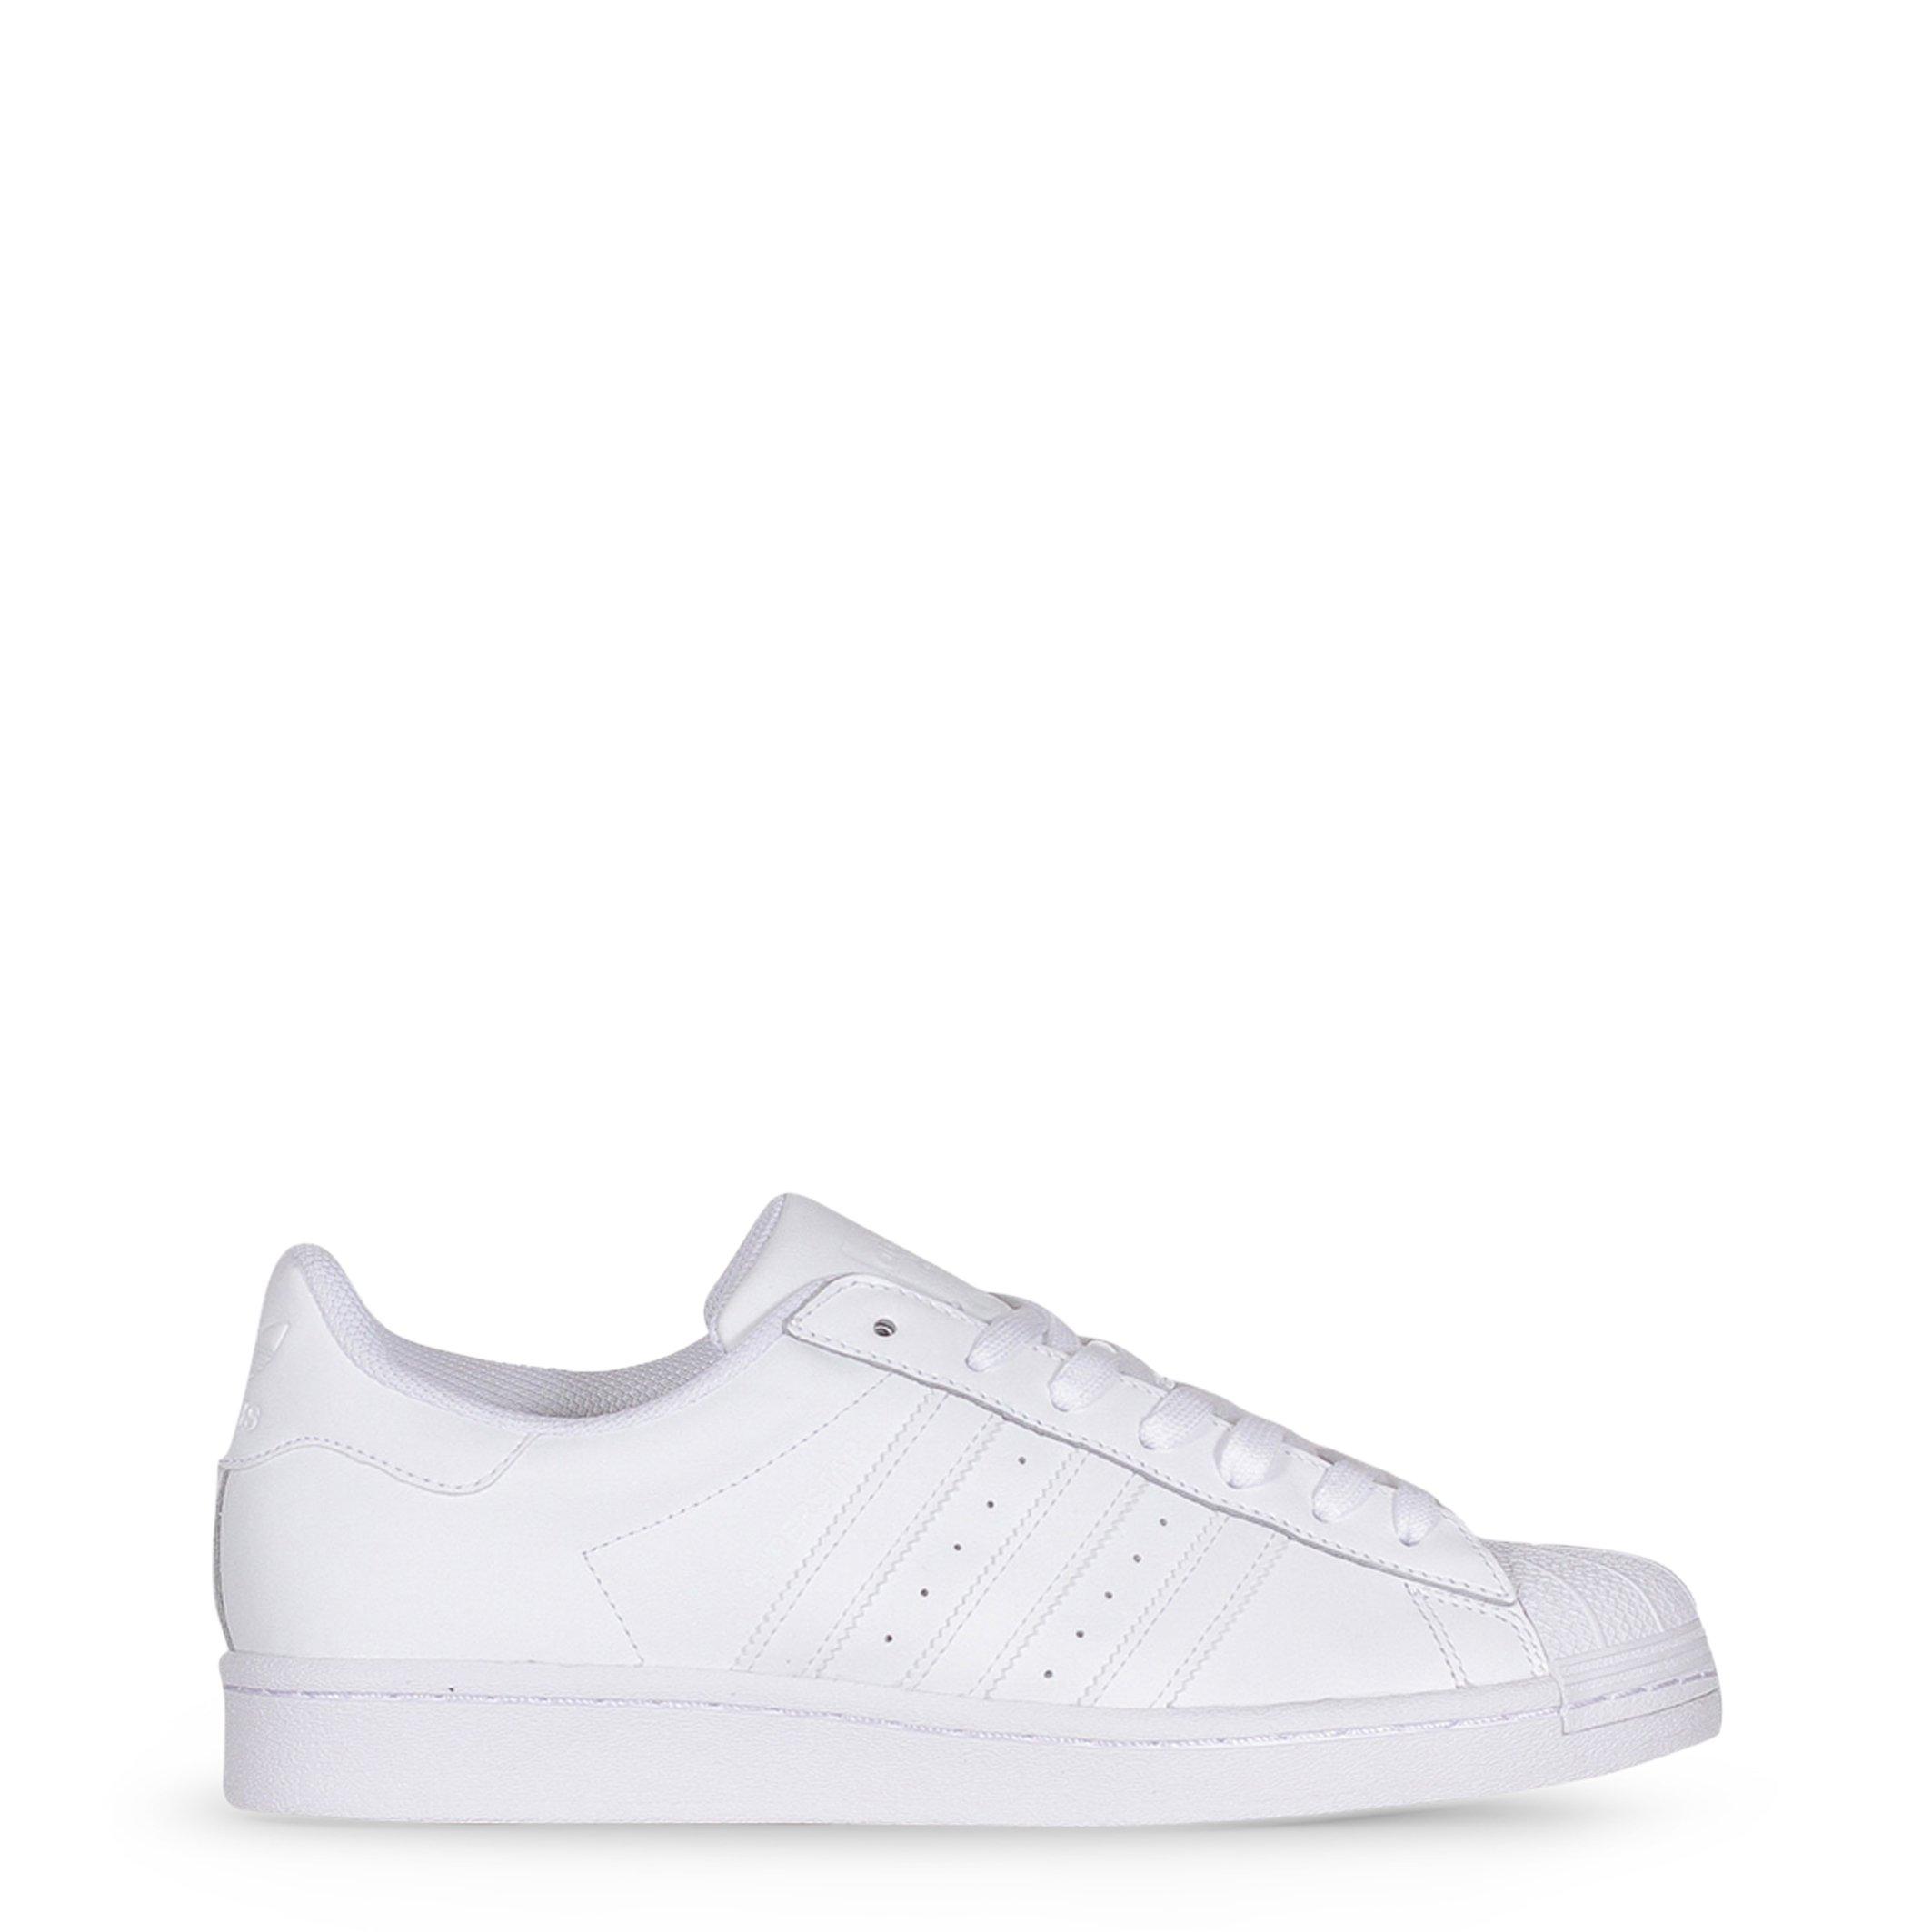 Adidas Women's Trainer Various Colours Superstar - white-1 UK 9.5